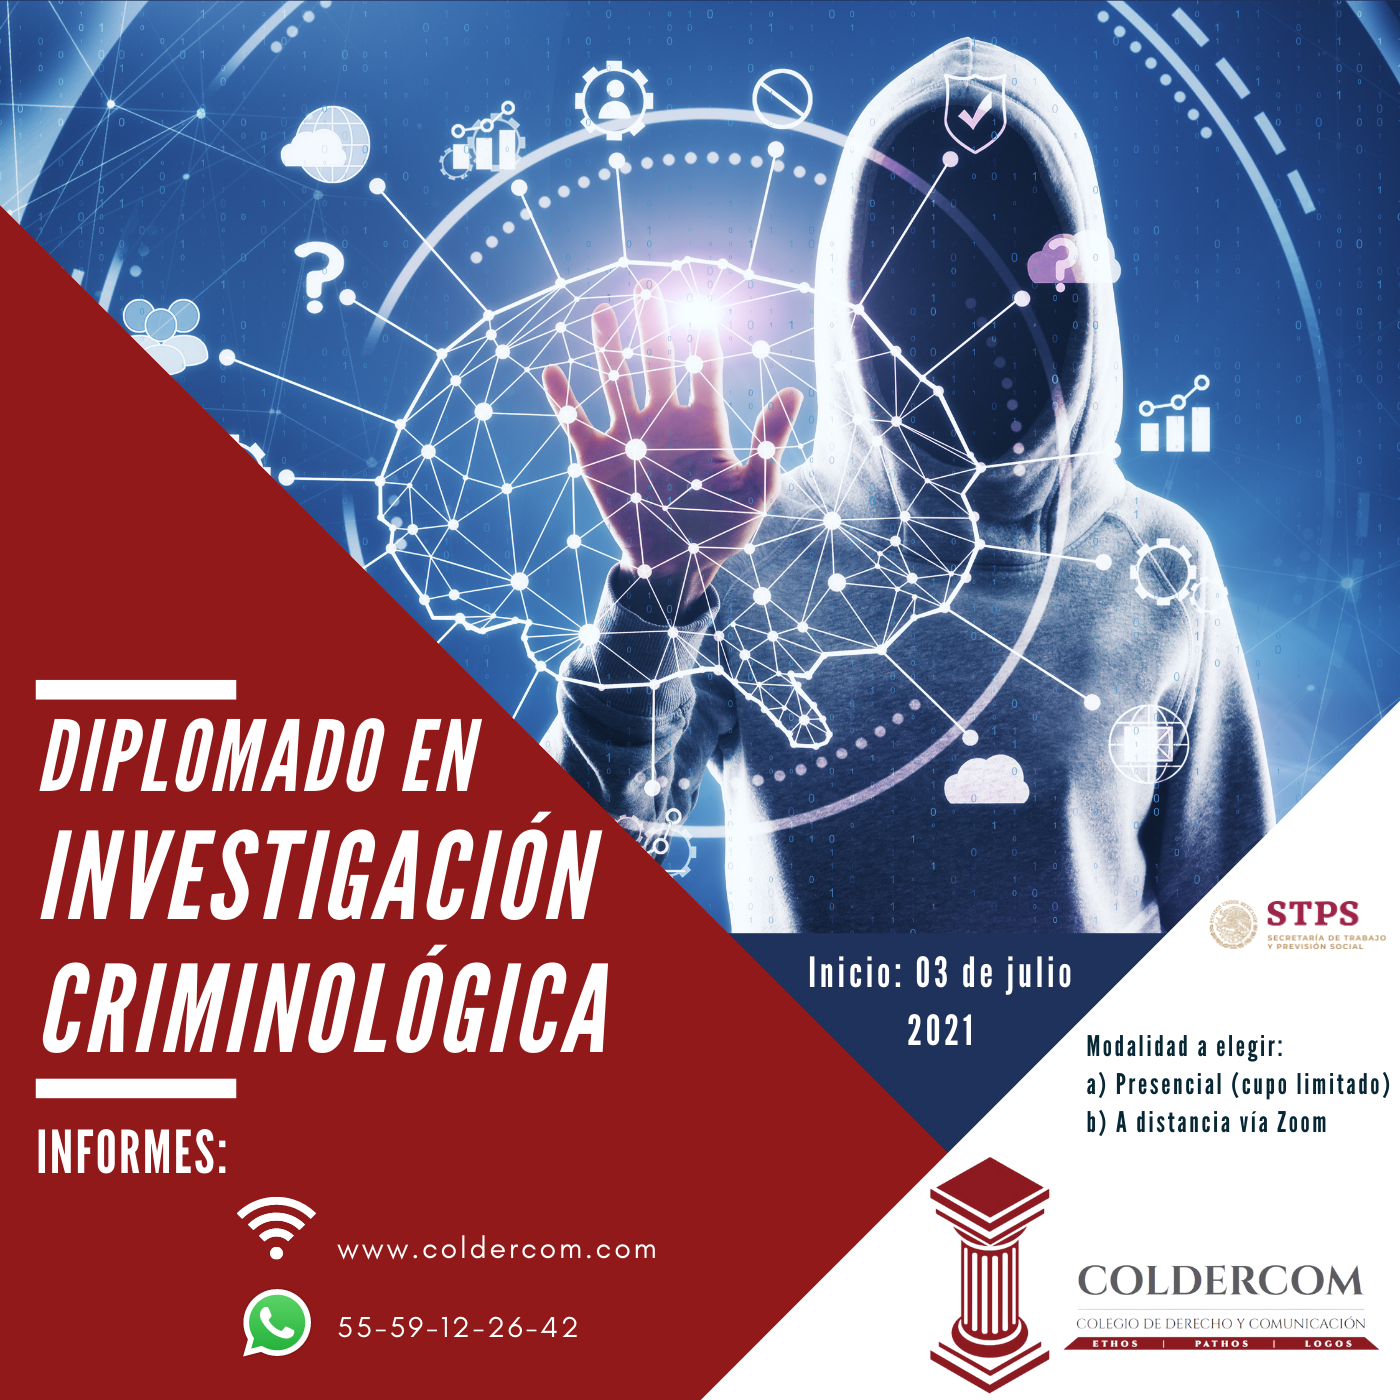 https://0201.nccdn.net/1_2/000/000/101/1c7/investigaci--n_criminol--gica.png